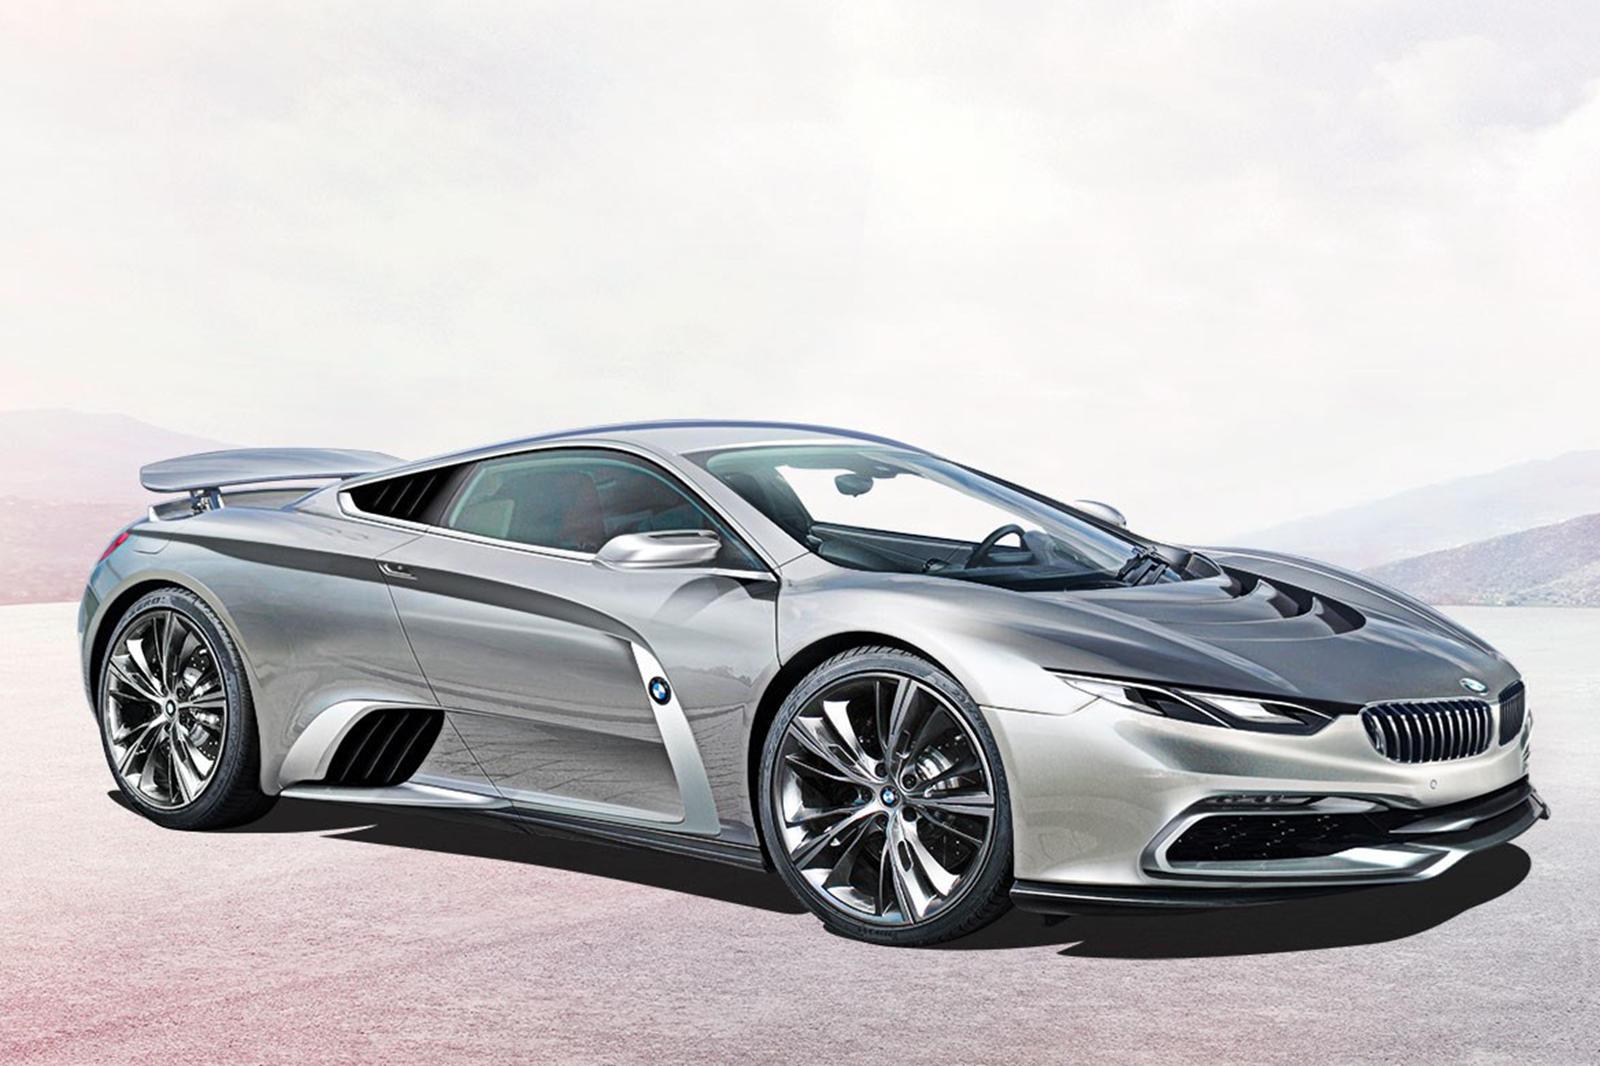 new bmw supercar will rival ferrari and mclaren